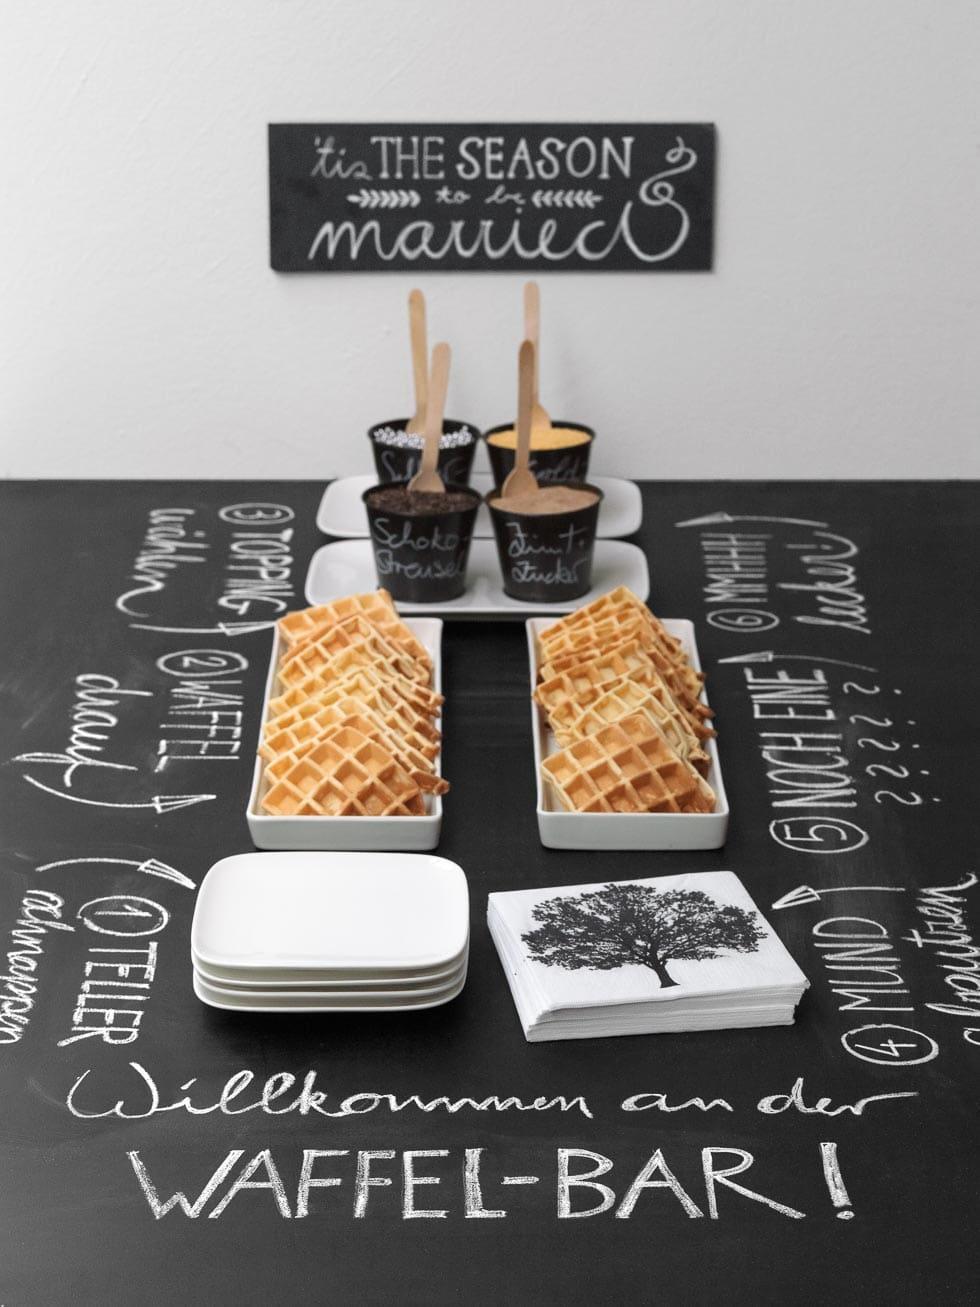 Sweet table: Waffelbar